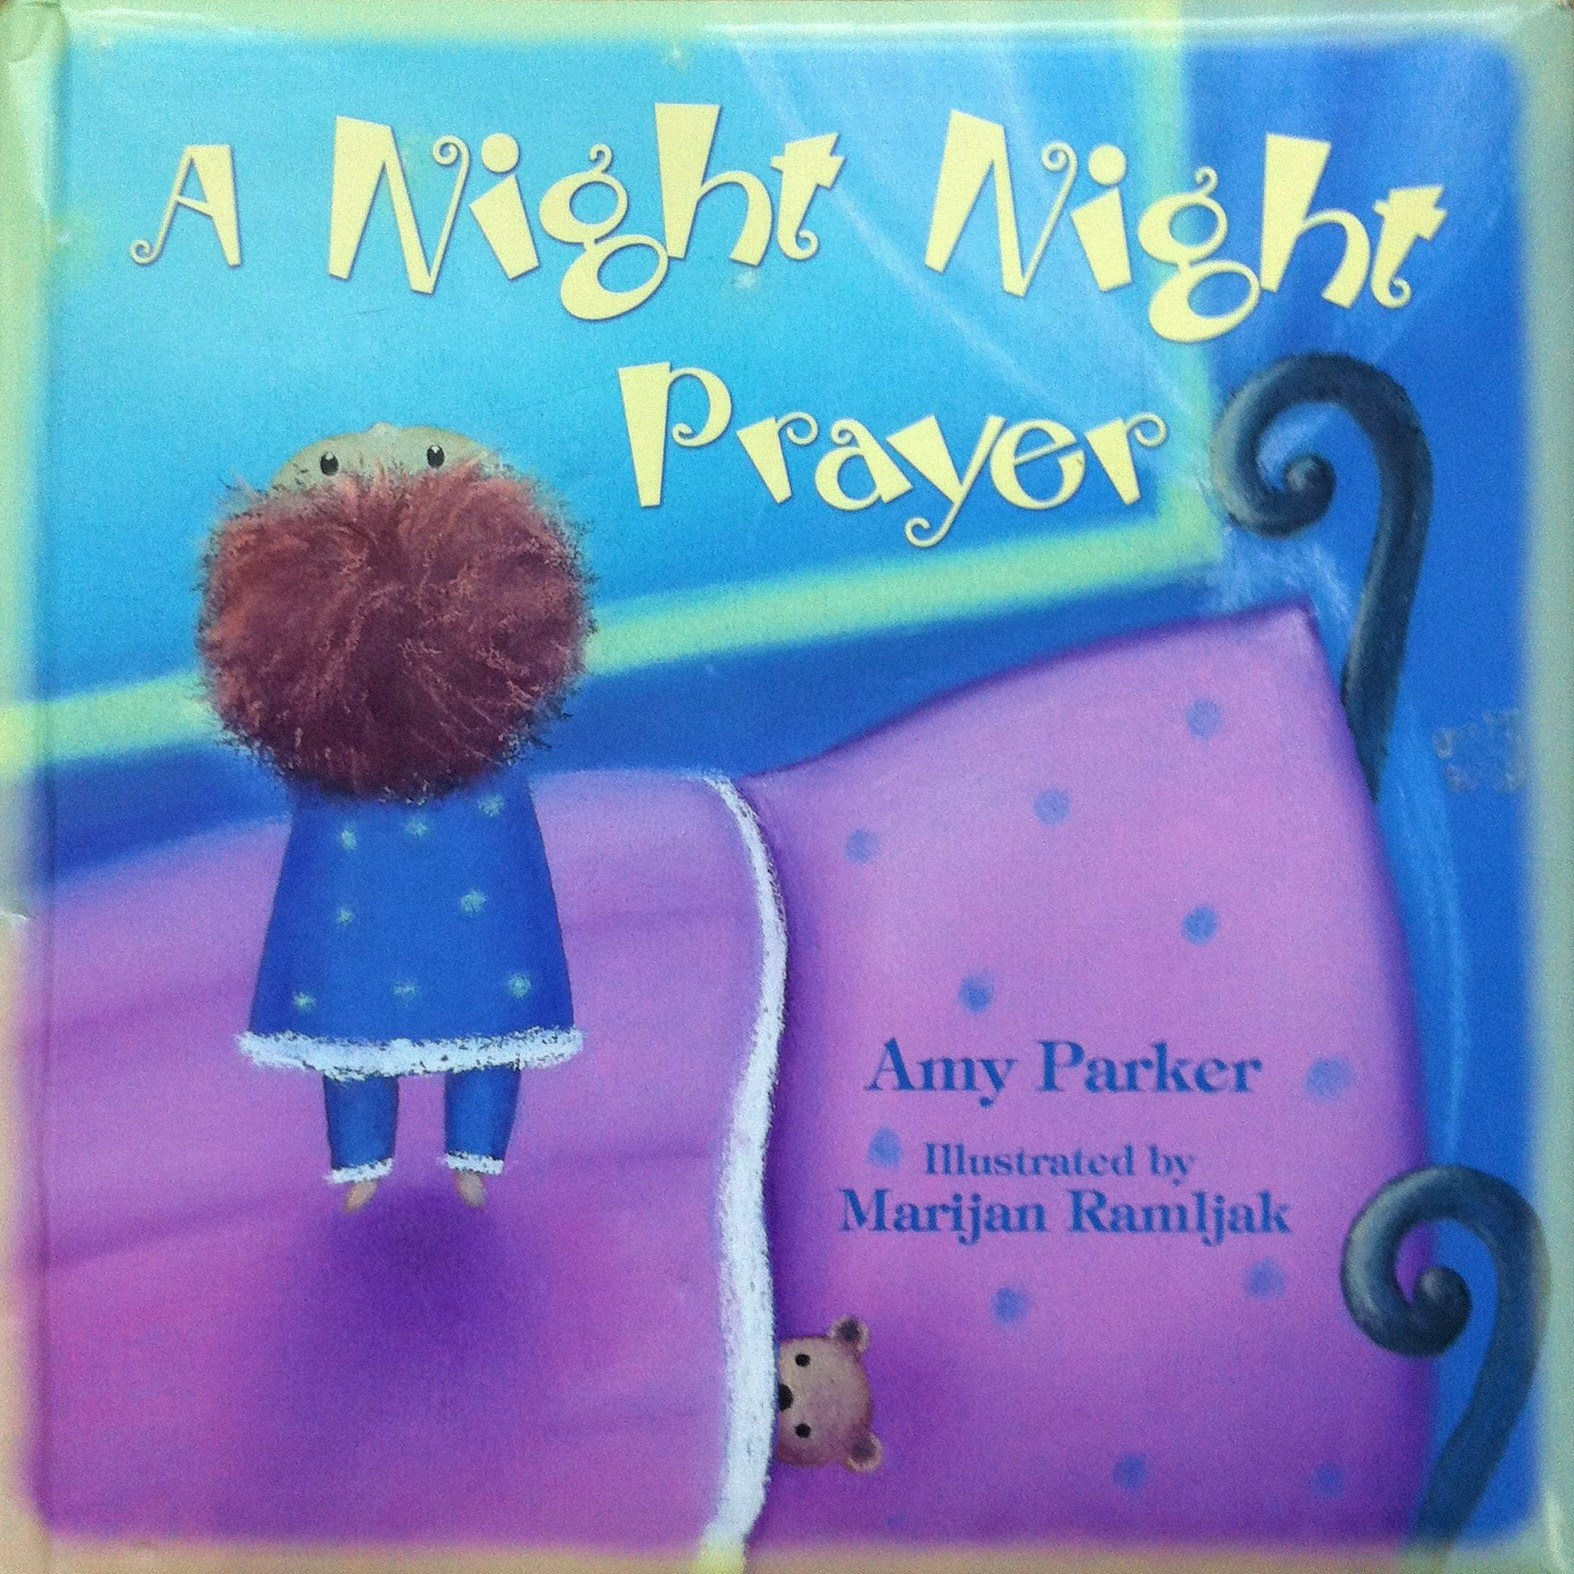 The Story. A Night Night Prayer ...